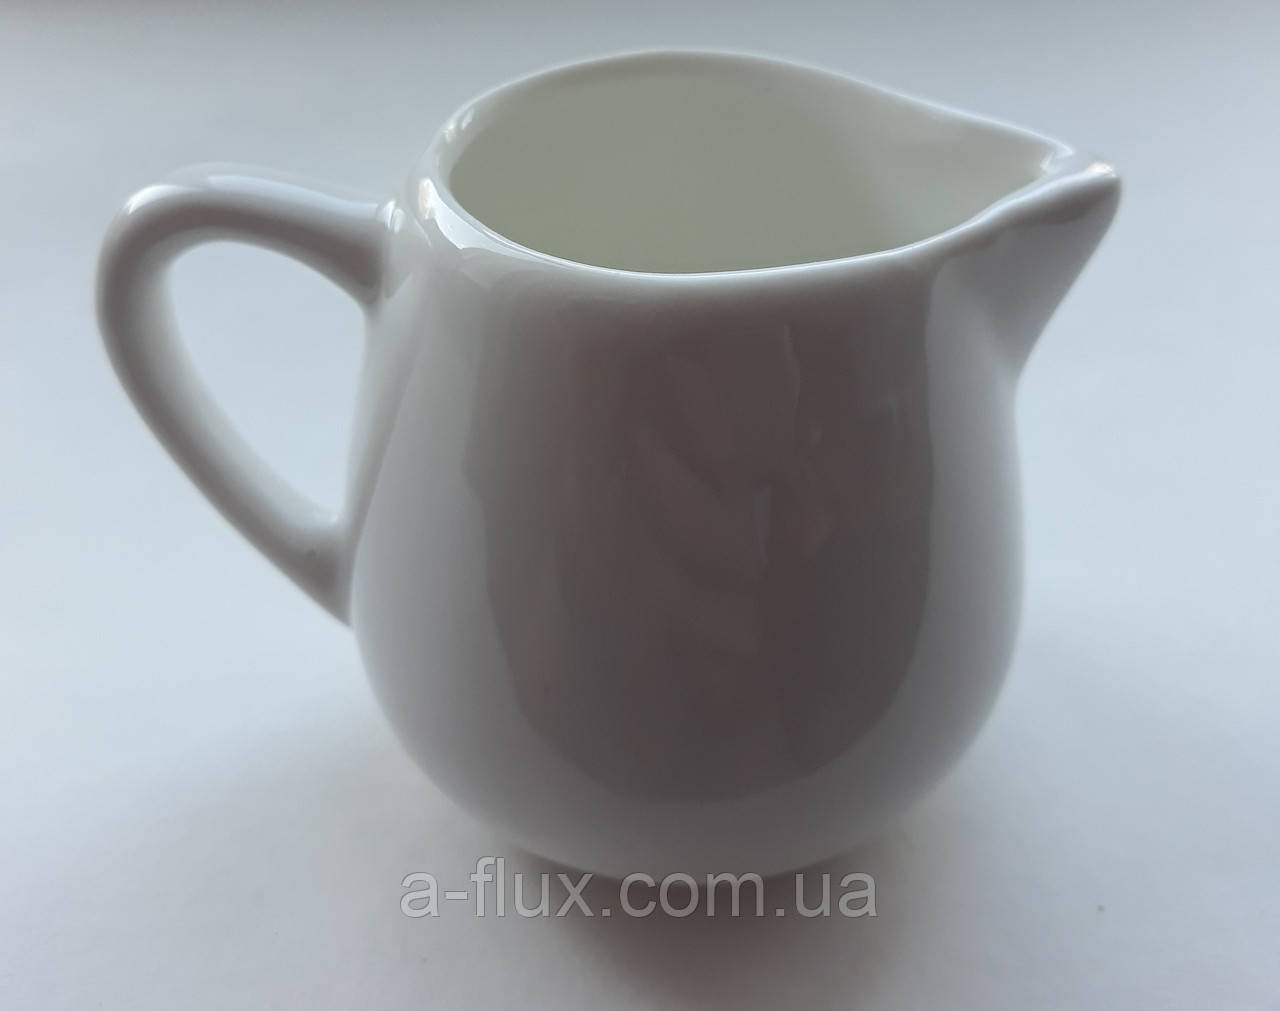 Молочник 70 мл фарфор белье Китай 0263Б